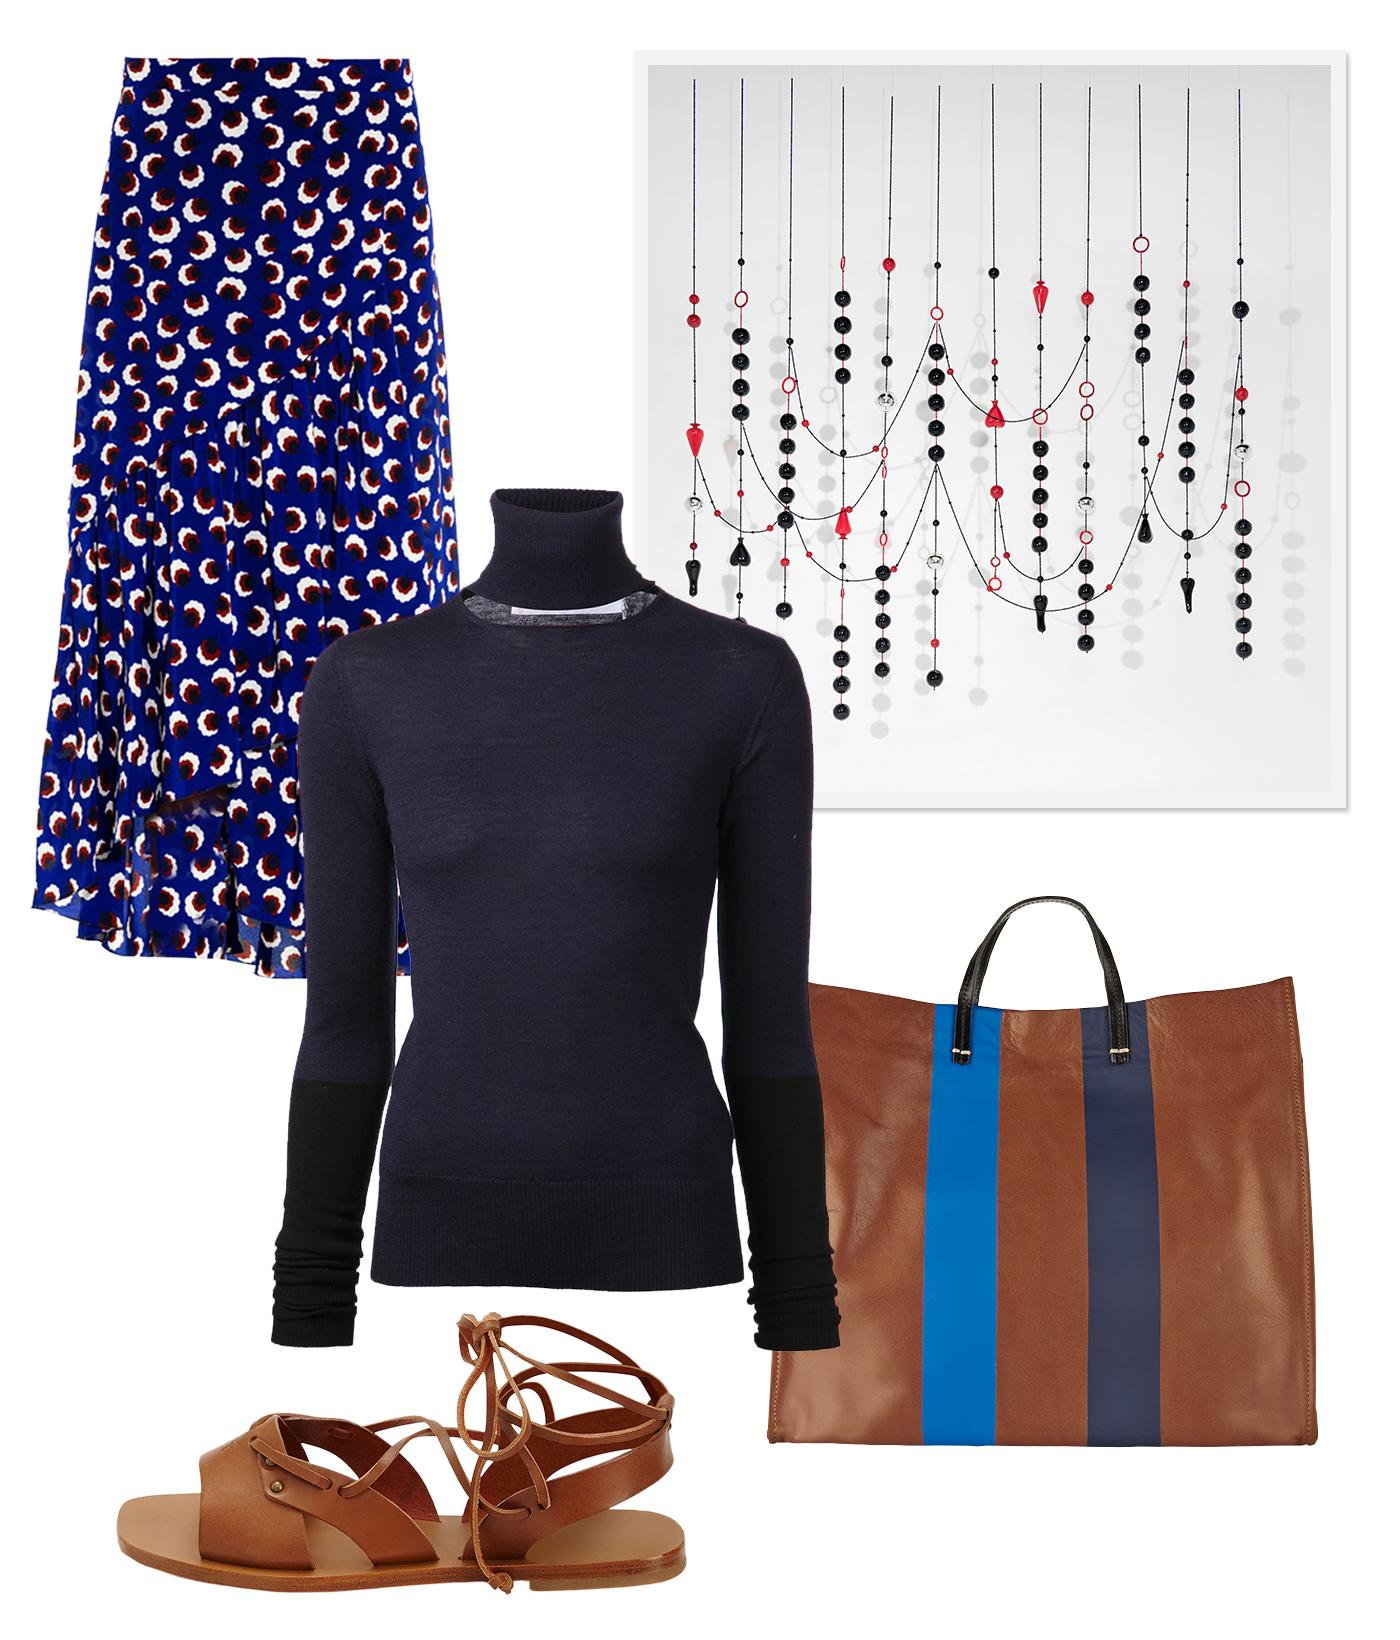 art-basel-outfit-ideas_06.jpg